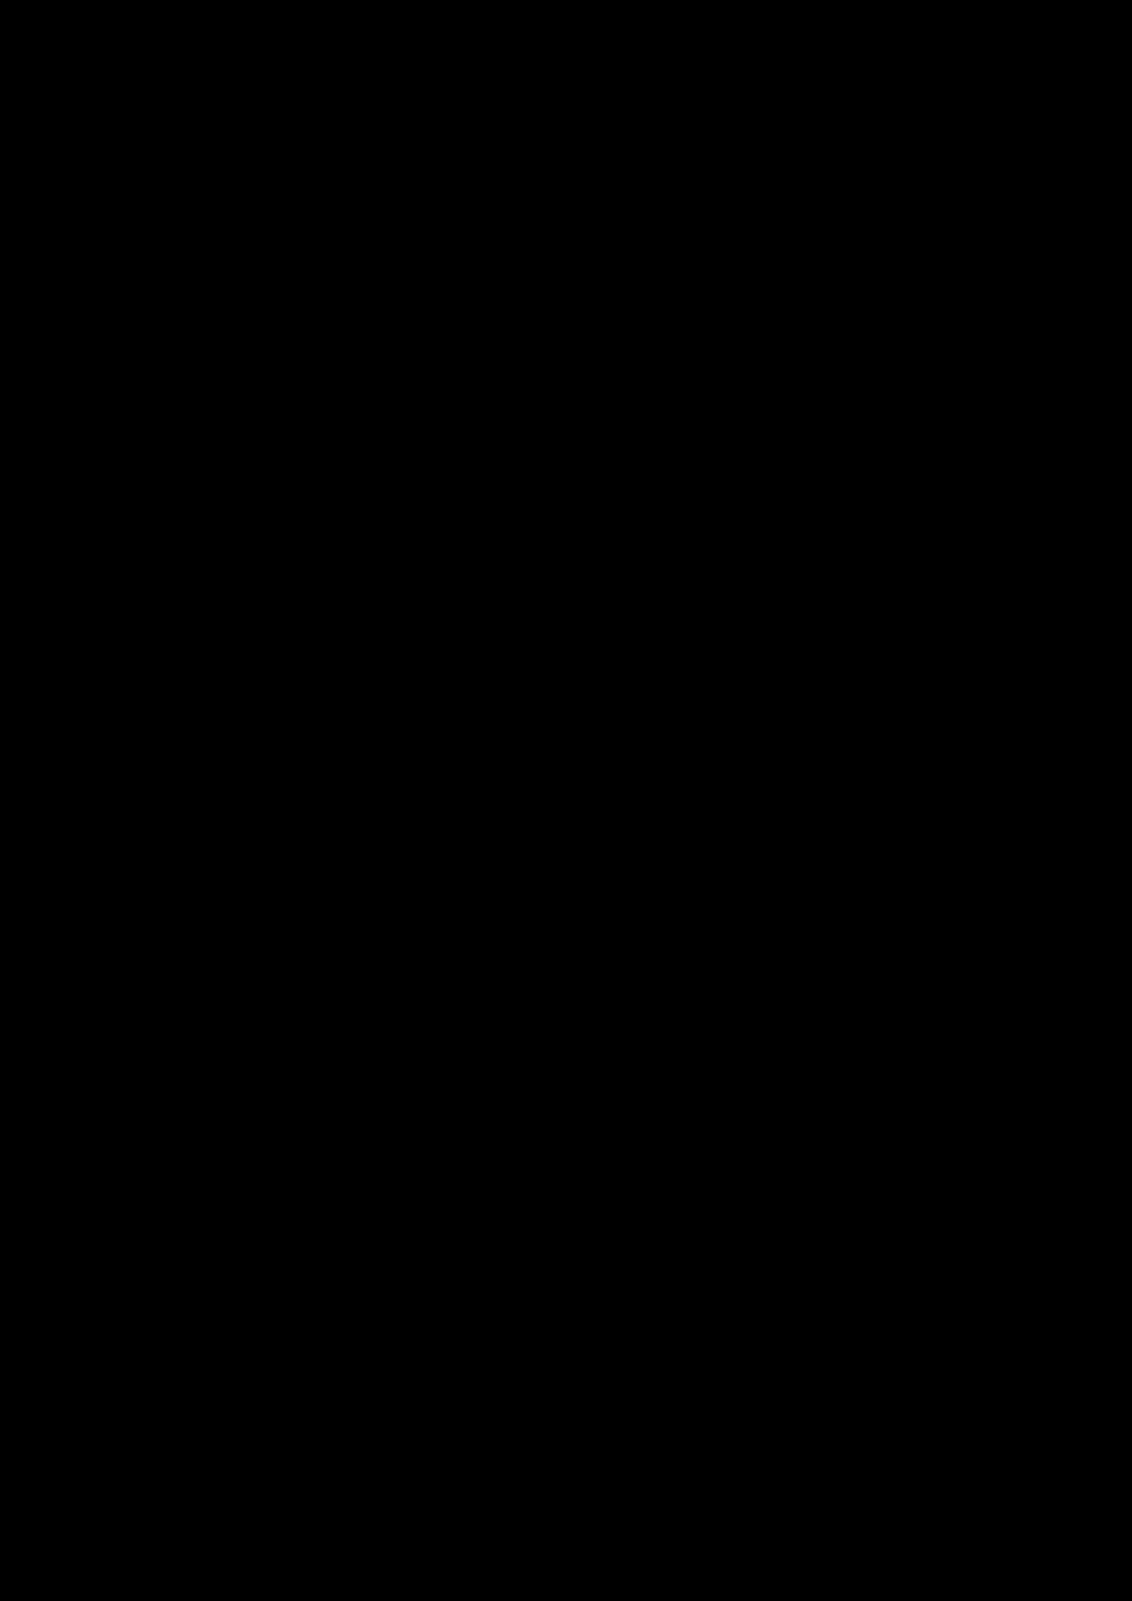 Okean Pustotyi slide, Image 48